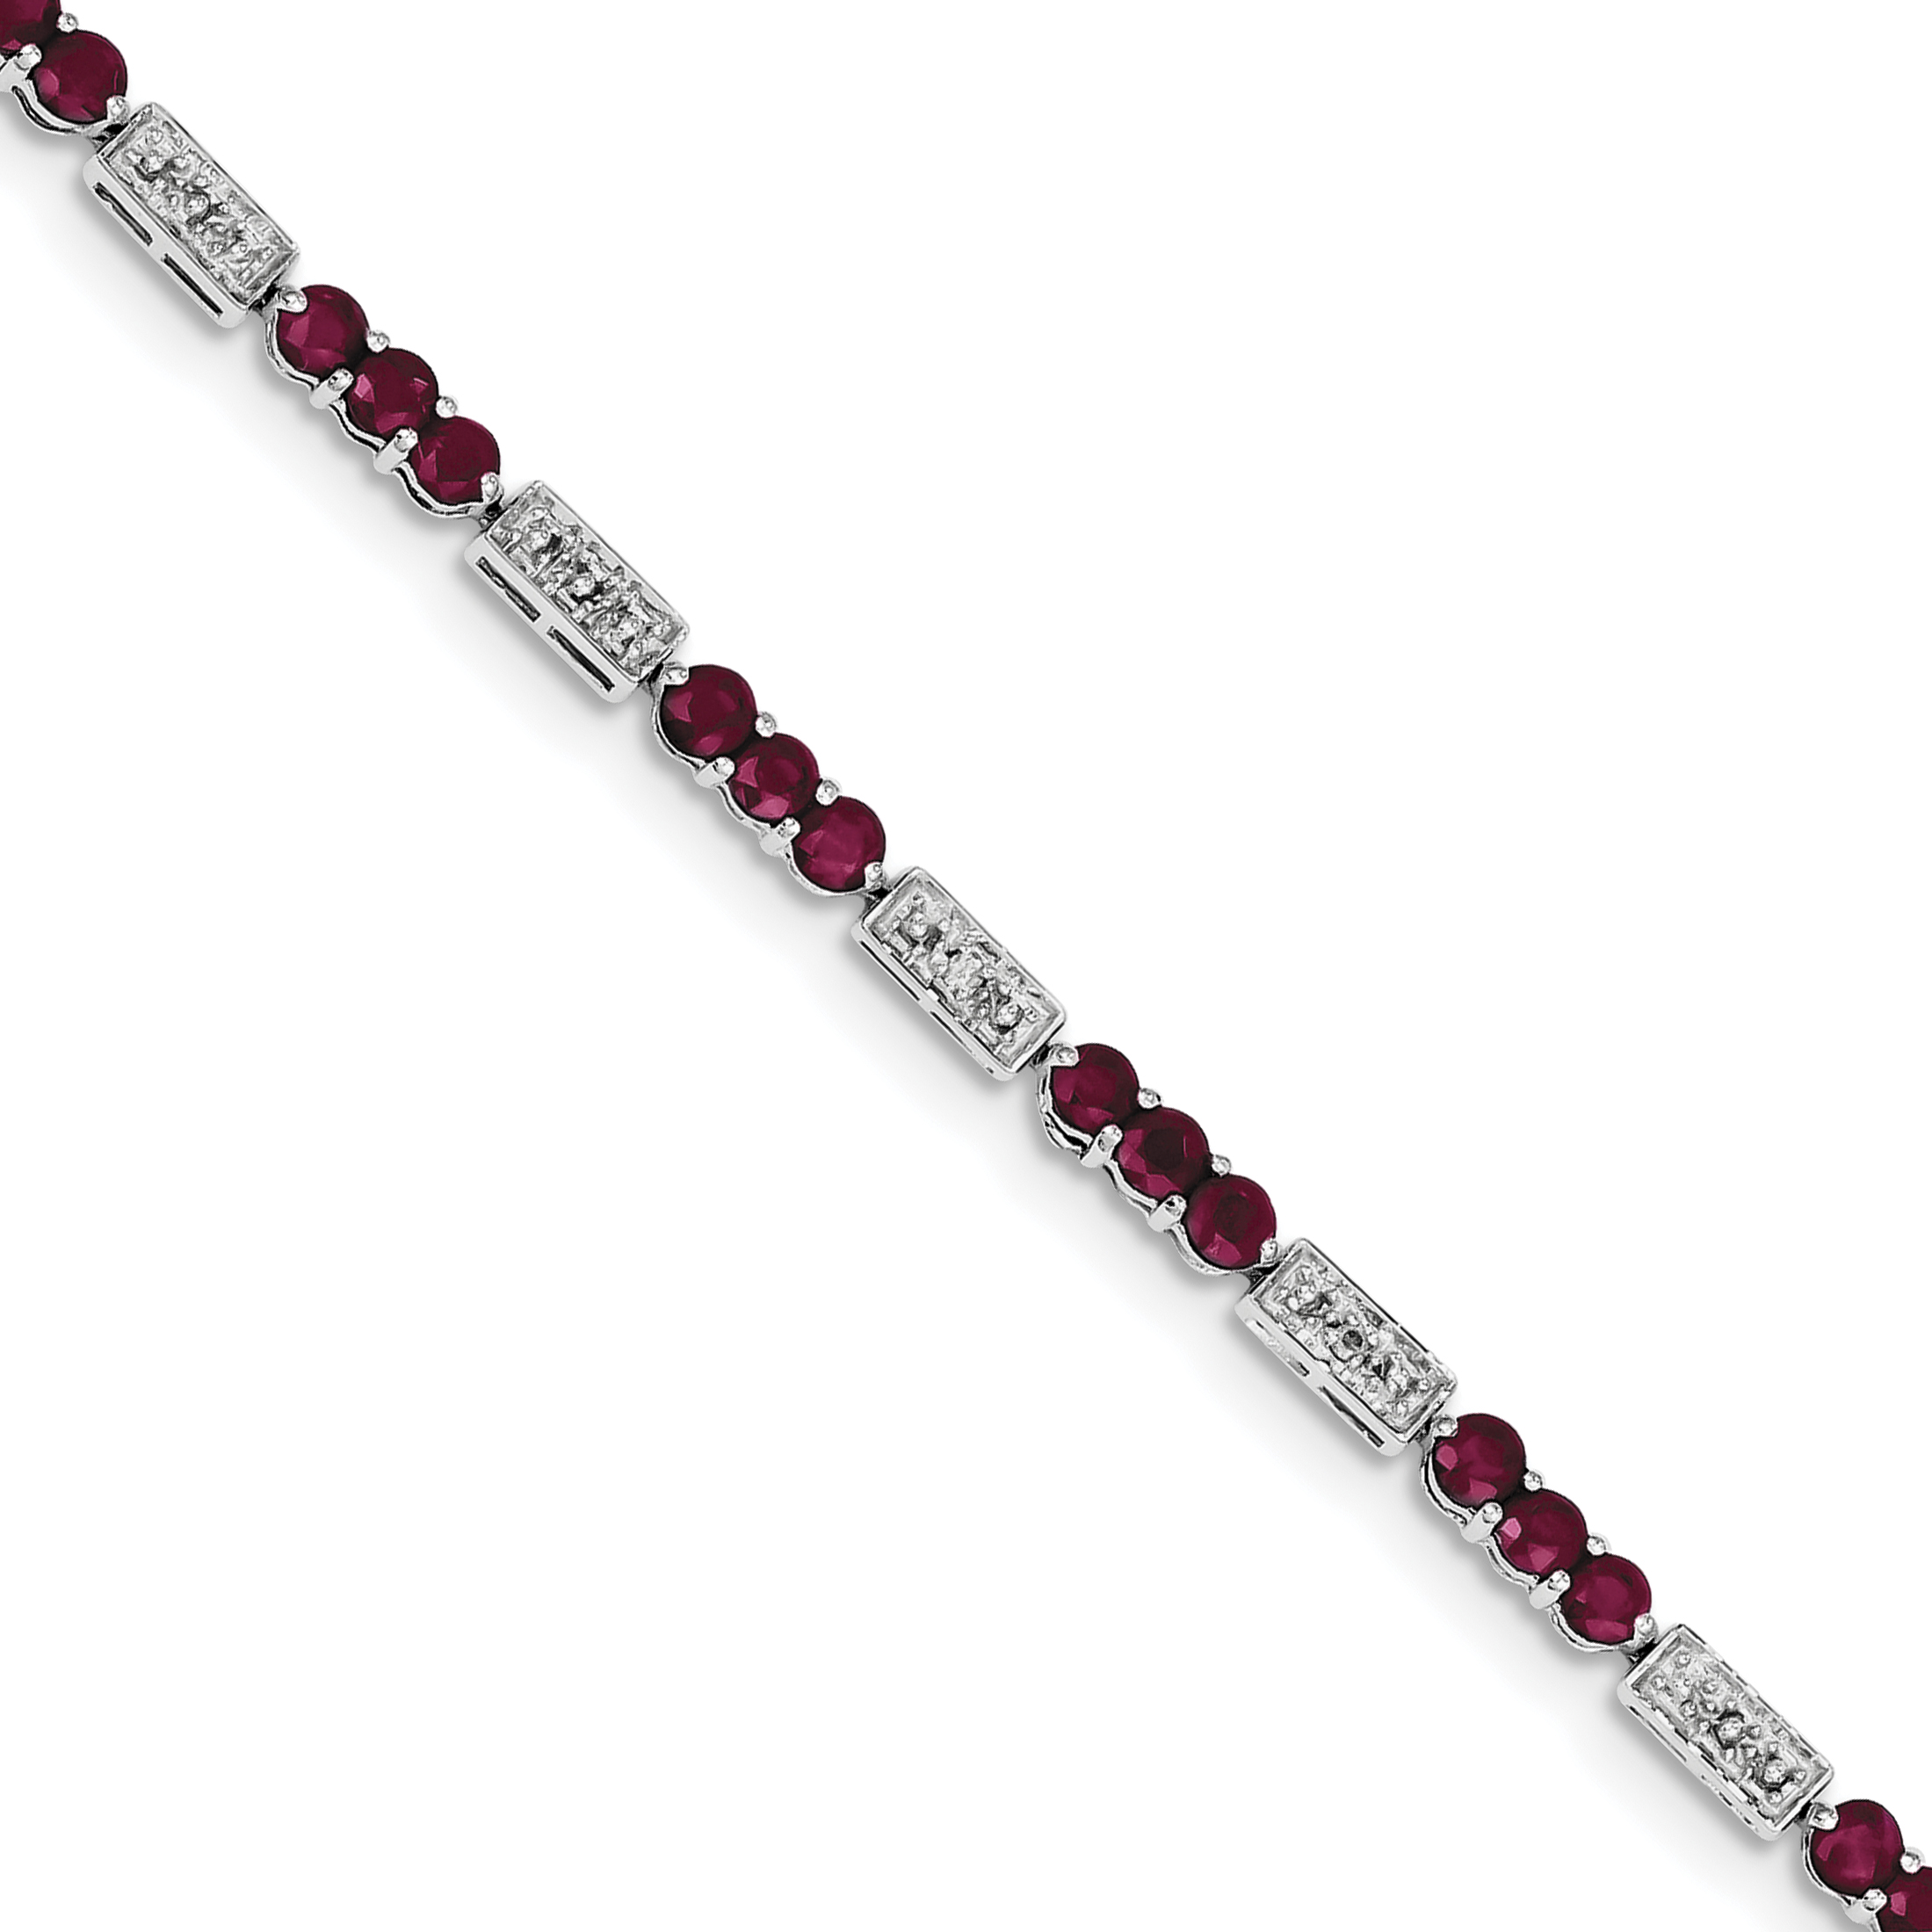 woman sterling silver Ruby Gemstone bracelet 7.5 Inch Mother/'s Day Gift Sterling Silver Ruby /& Diamond Stone Tennis Bracelet